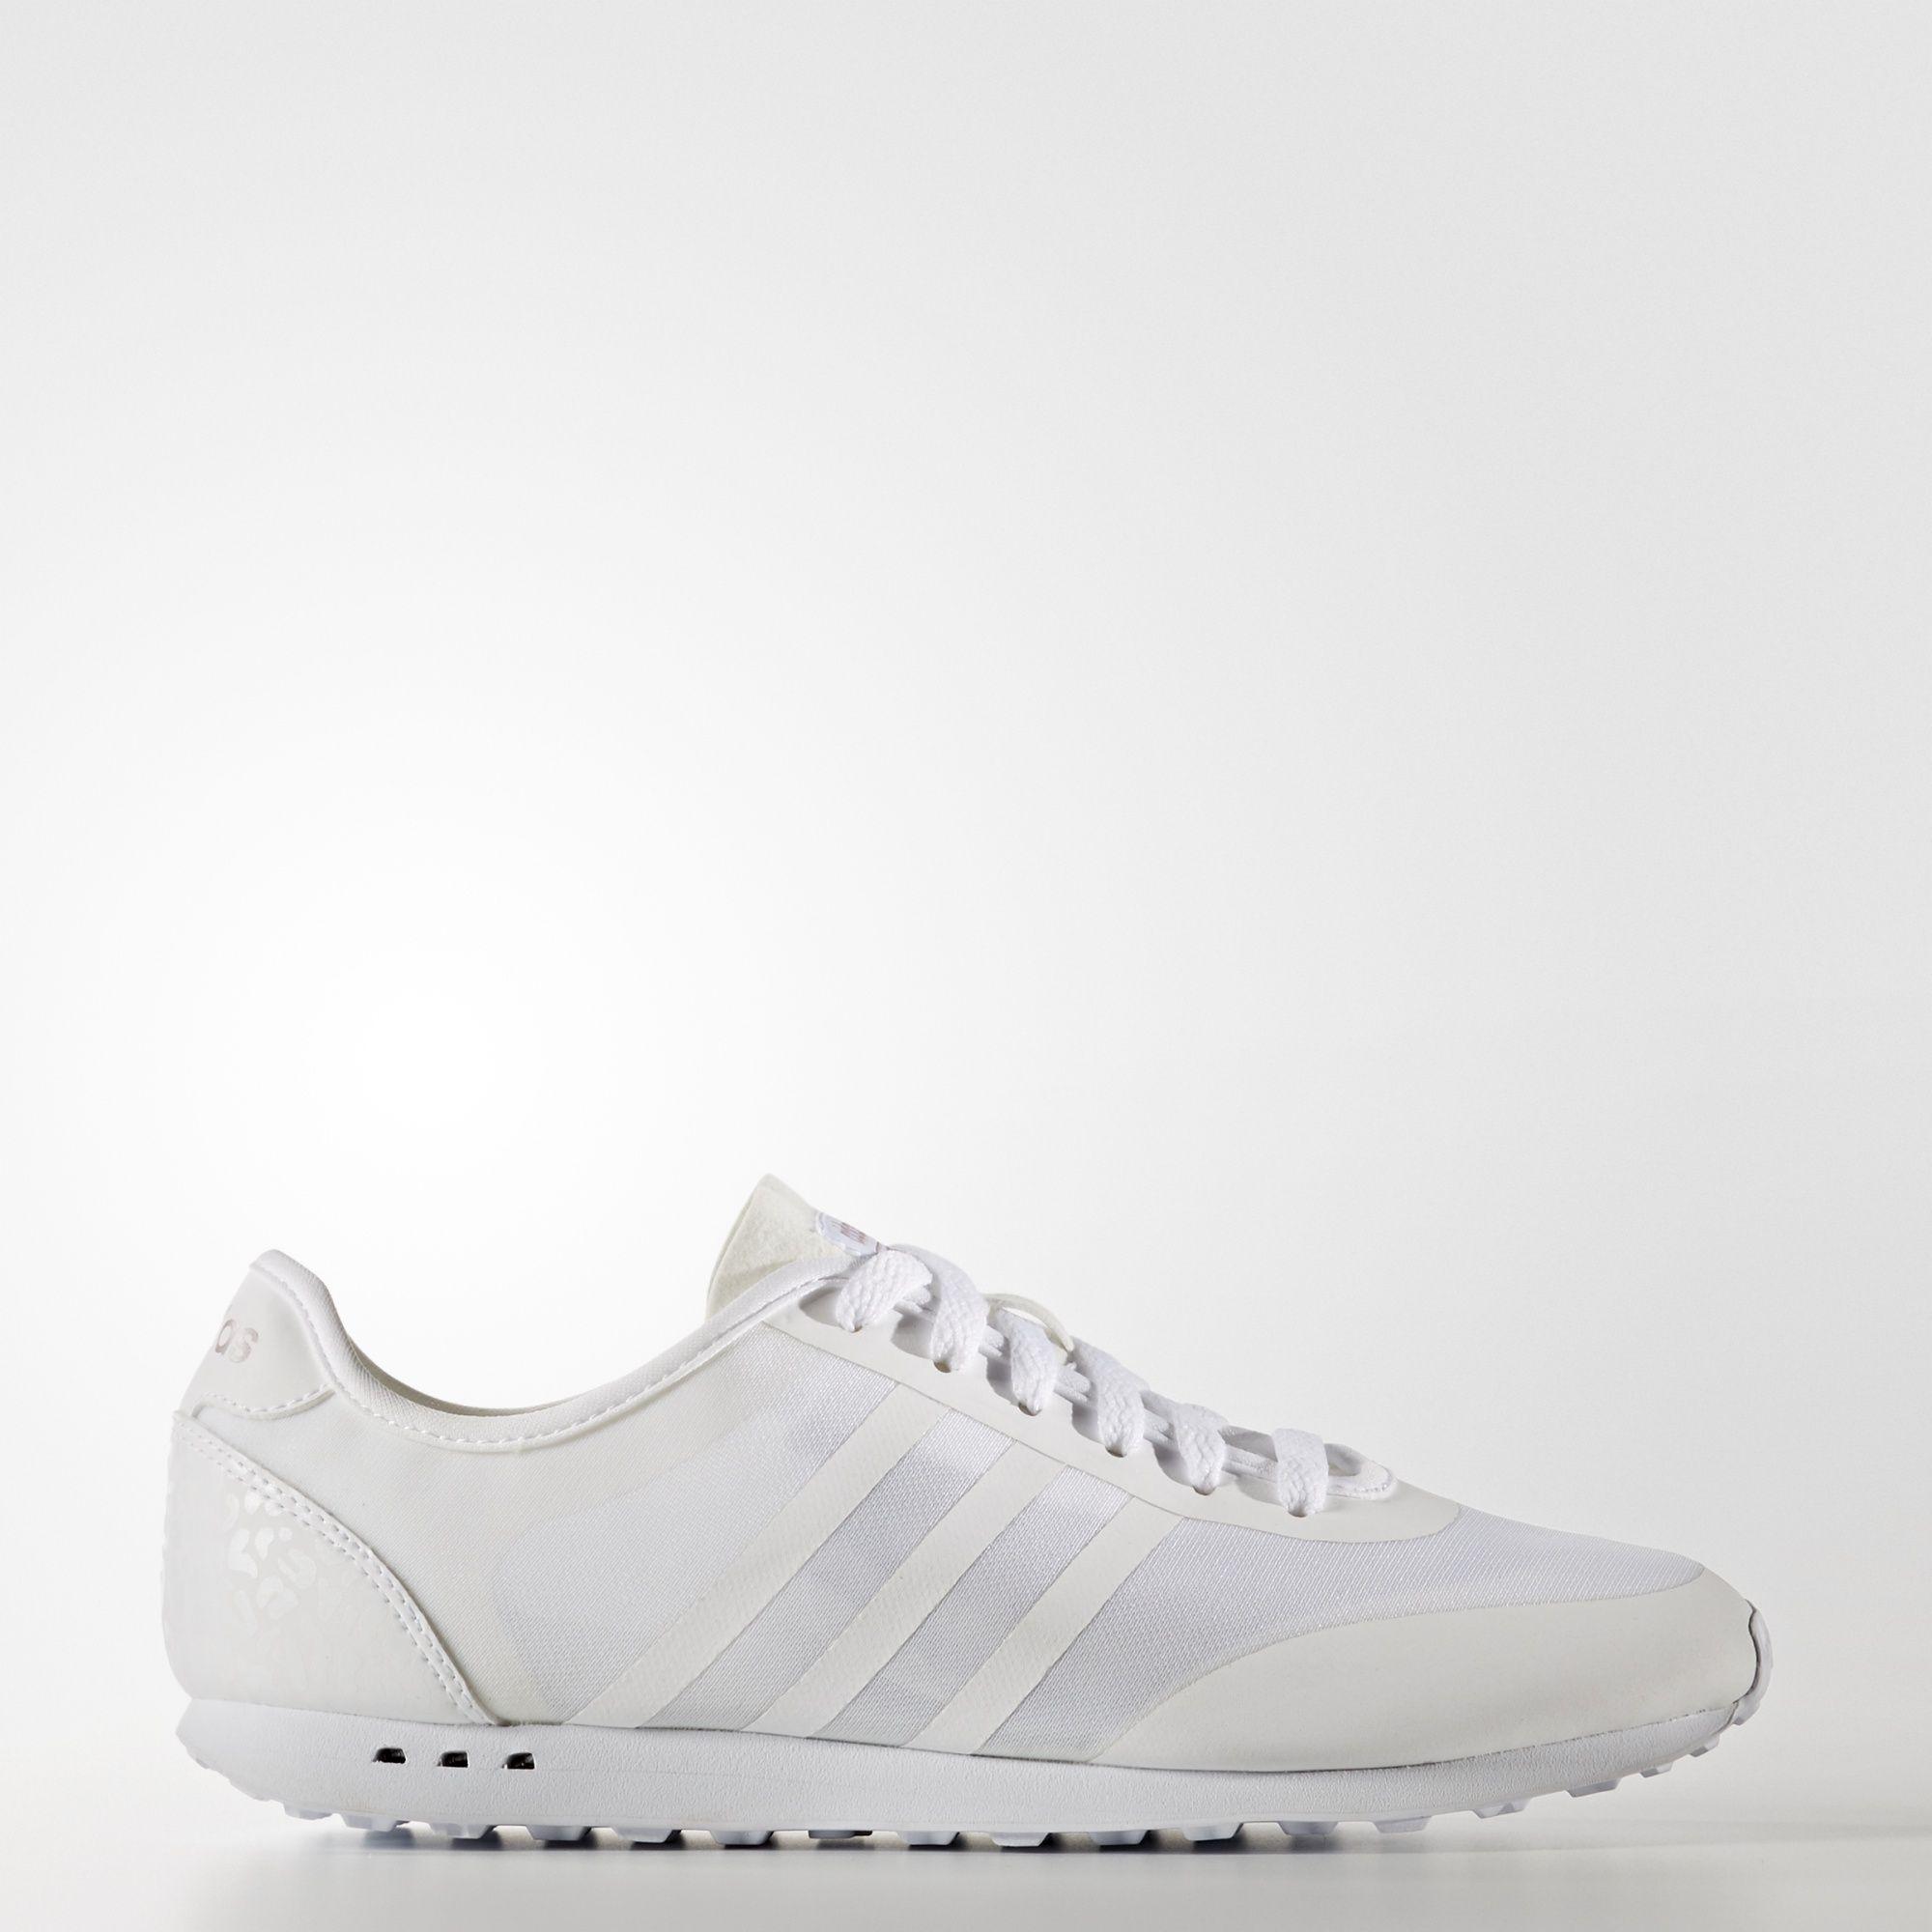 203fac67473 Adidas CLOUDFOAM GROOVE TM SHOES